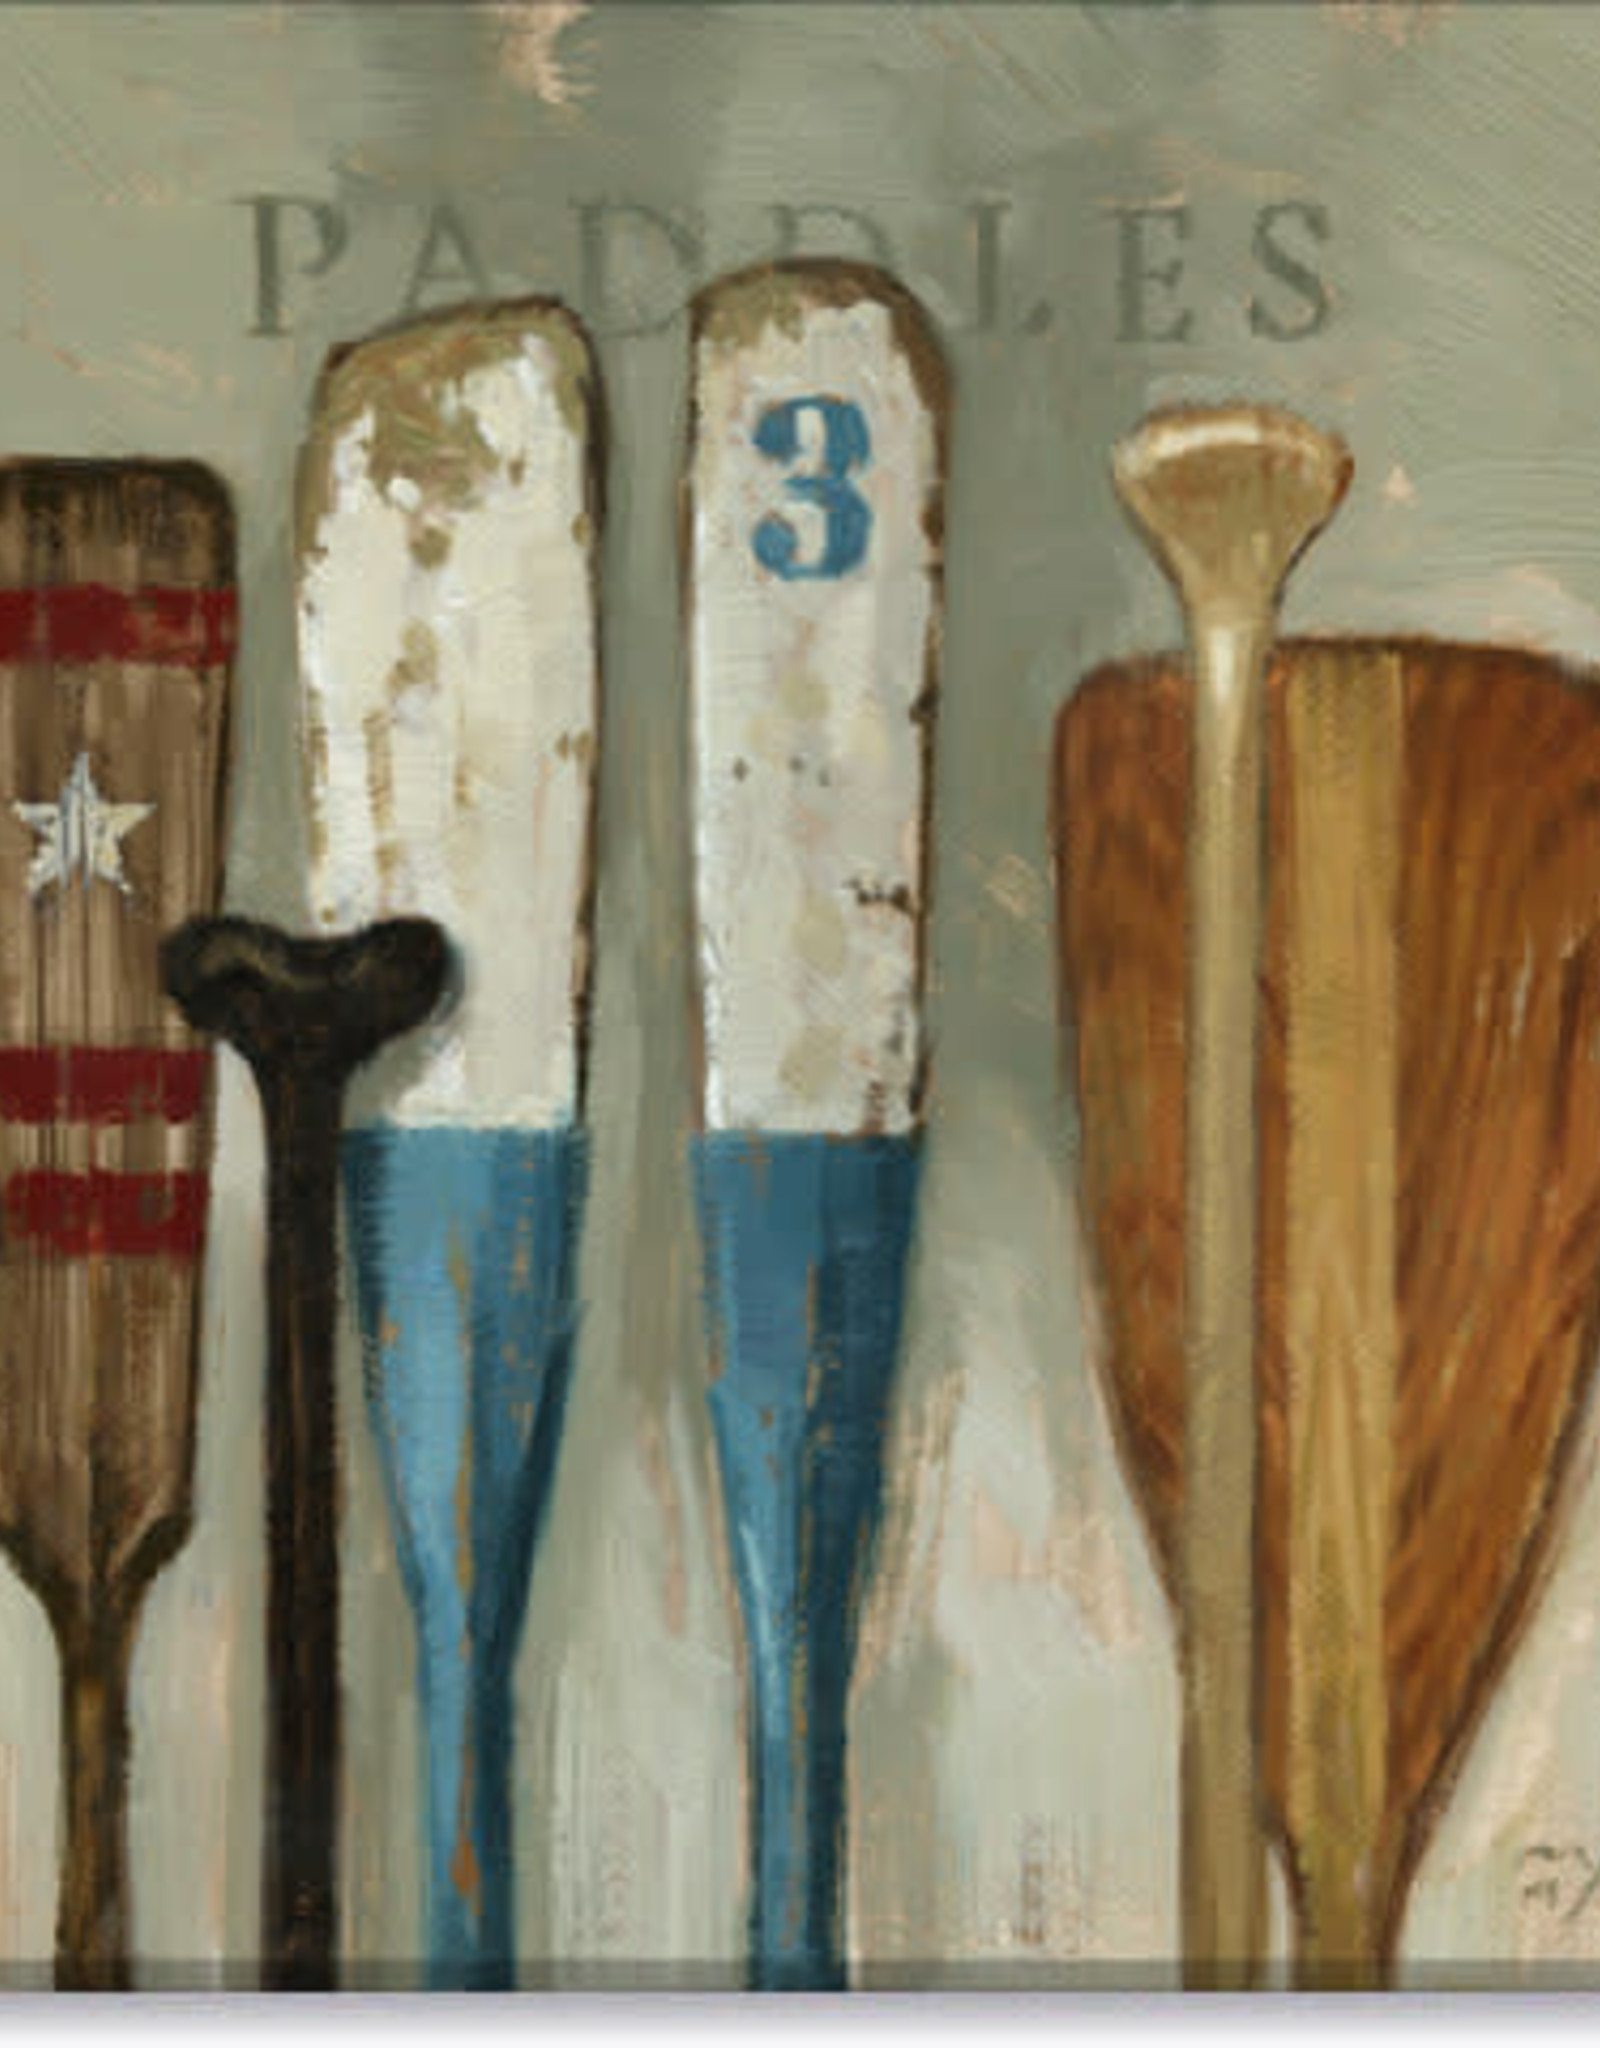 Sullivans Paddles Giclee Wall Art 20x20